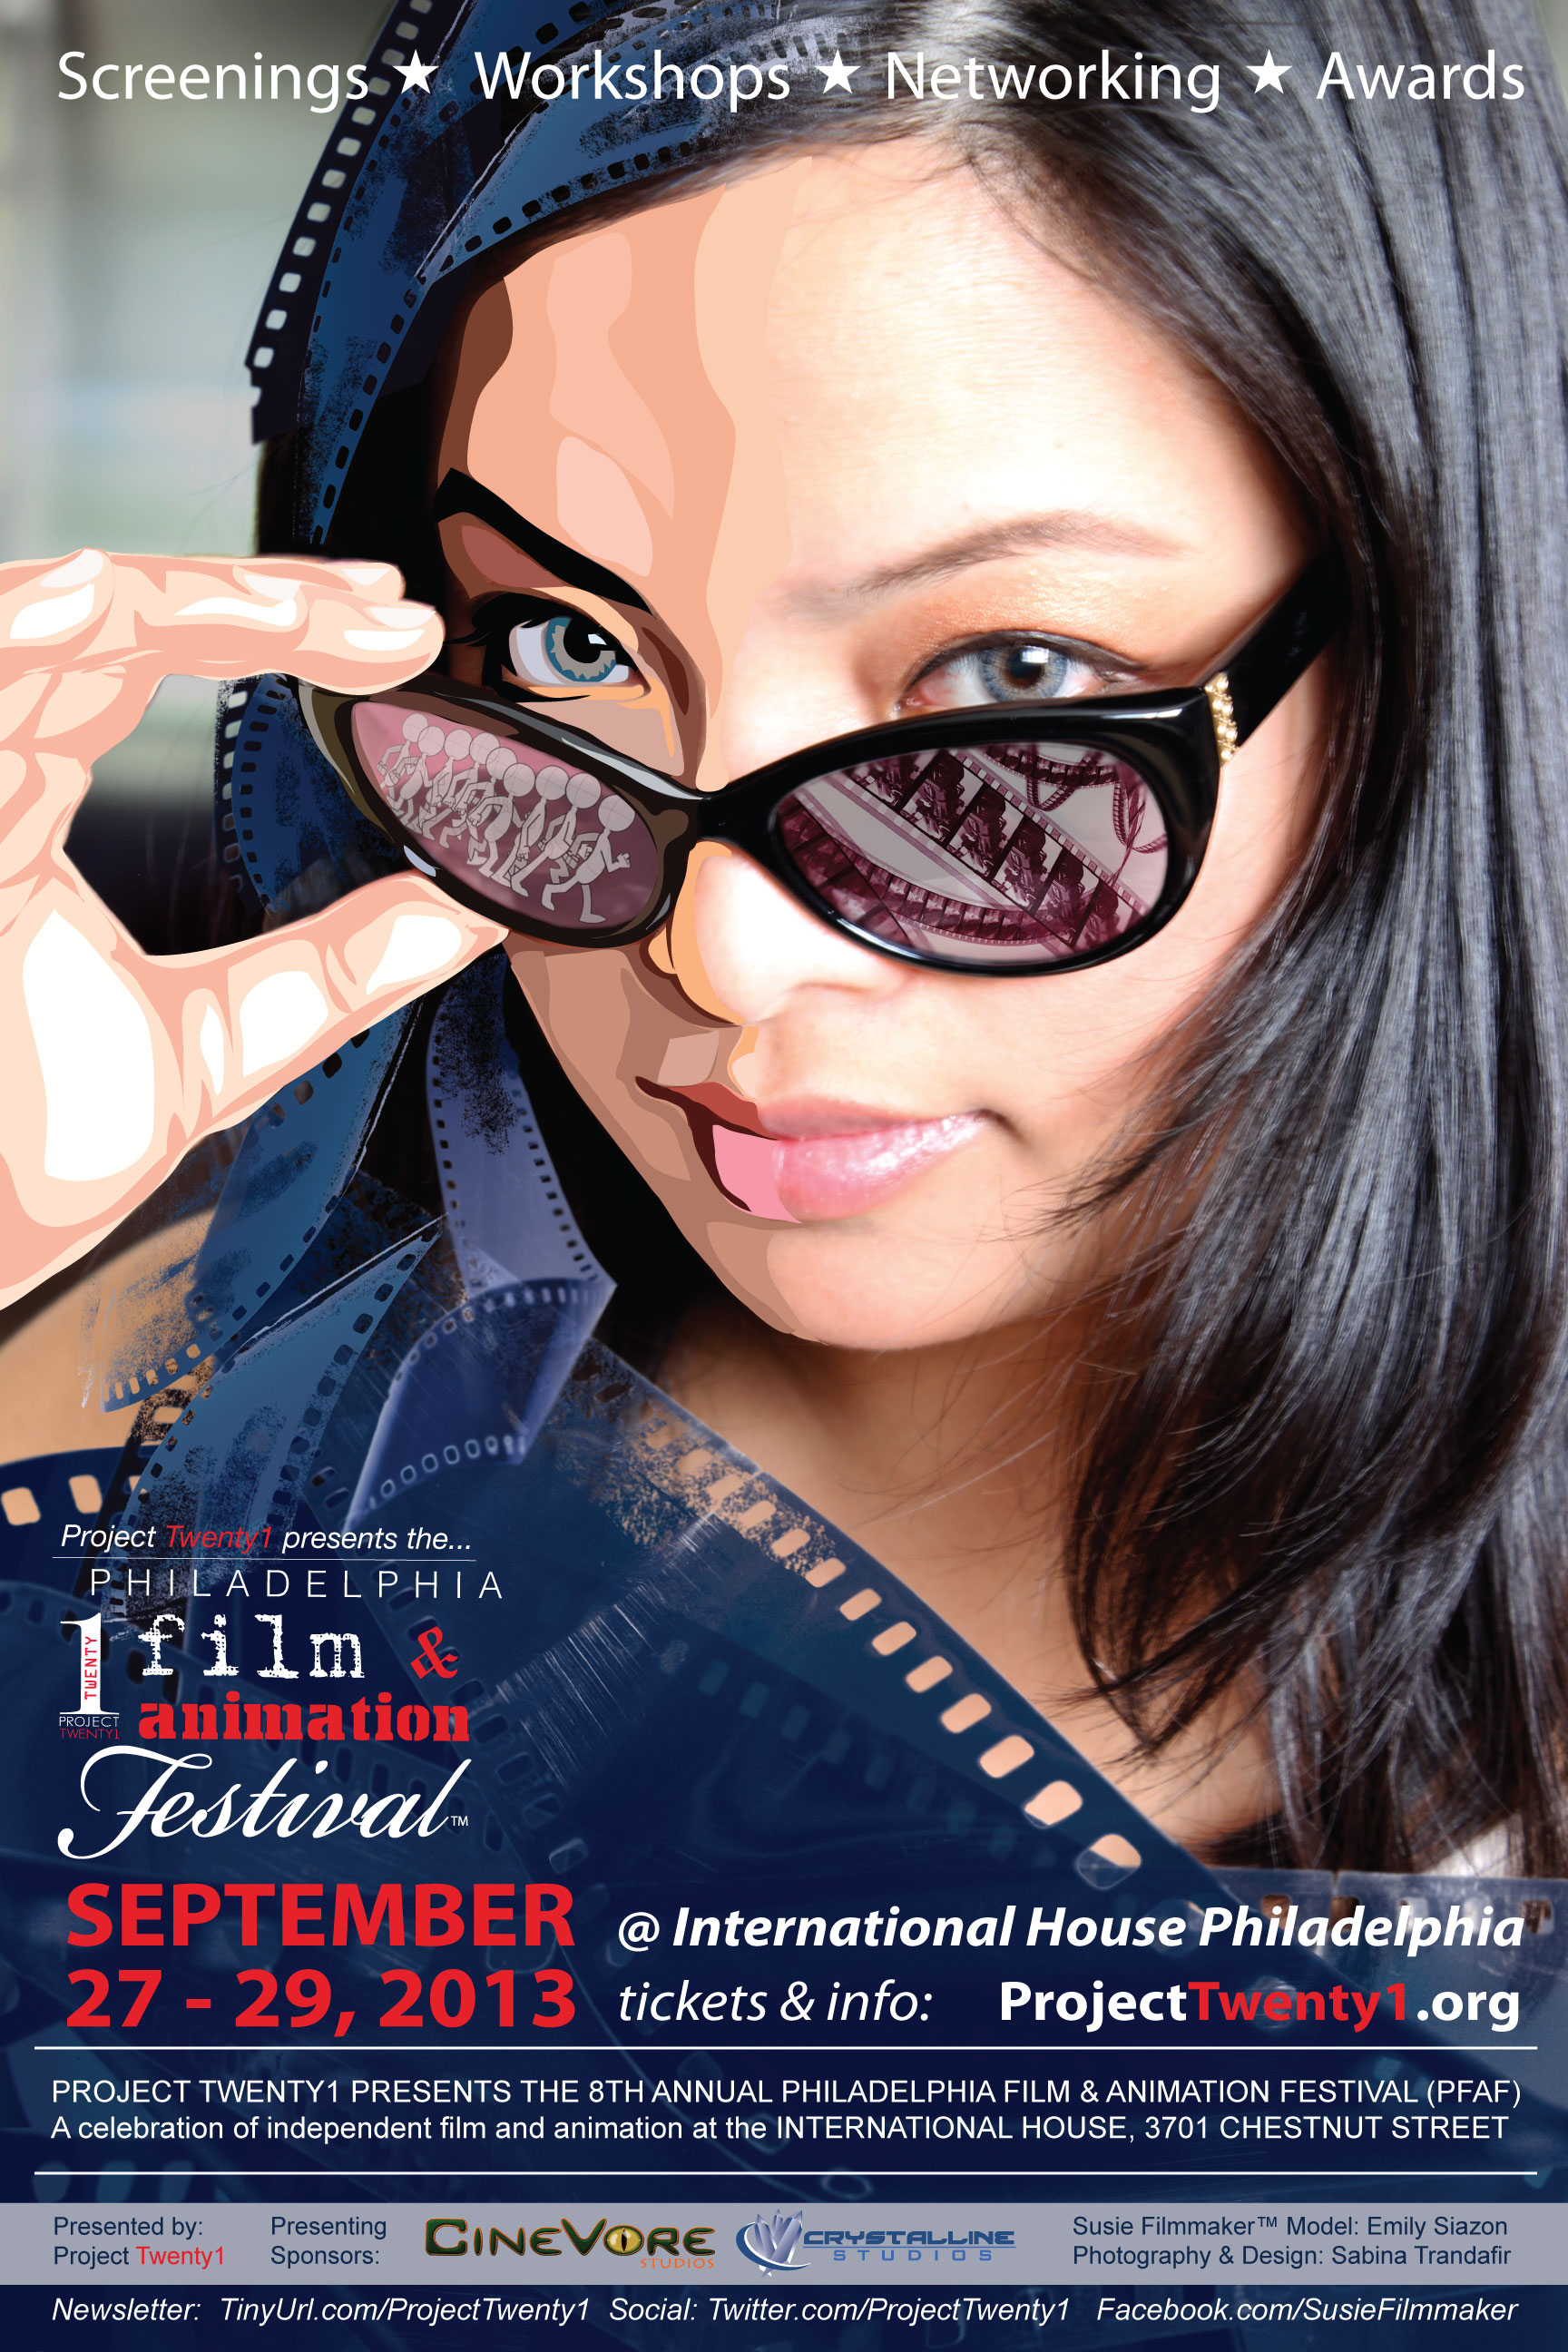 8th ANNUAL PHILADELPHIA FILM & ANIMATION FESTIVAL